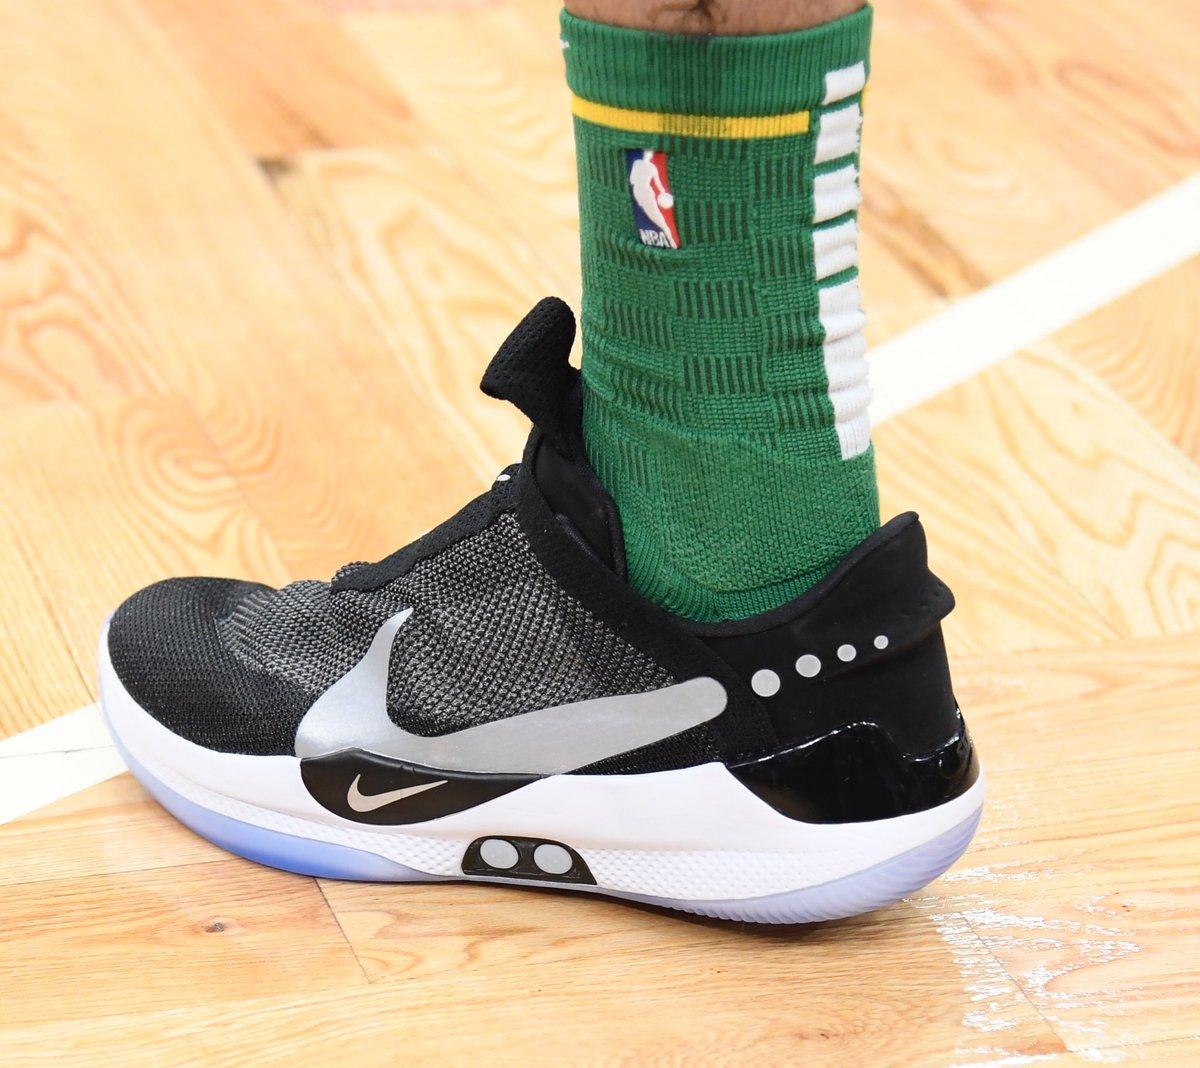 Jayson Tatum debuting the Nike Adapt BB